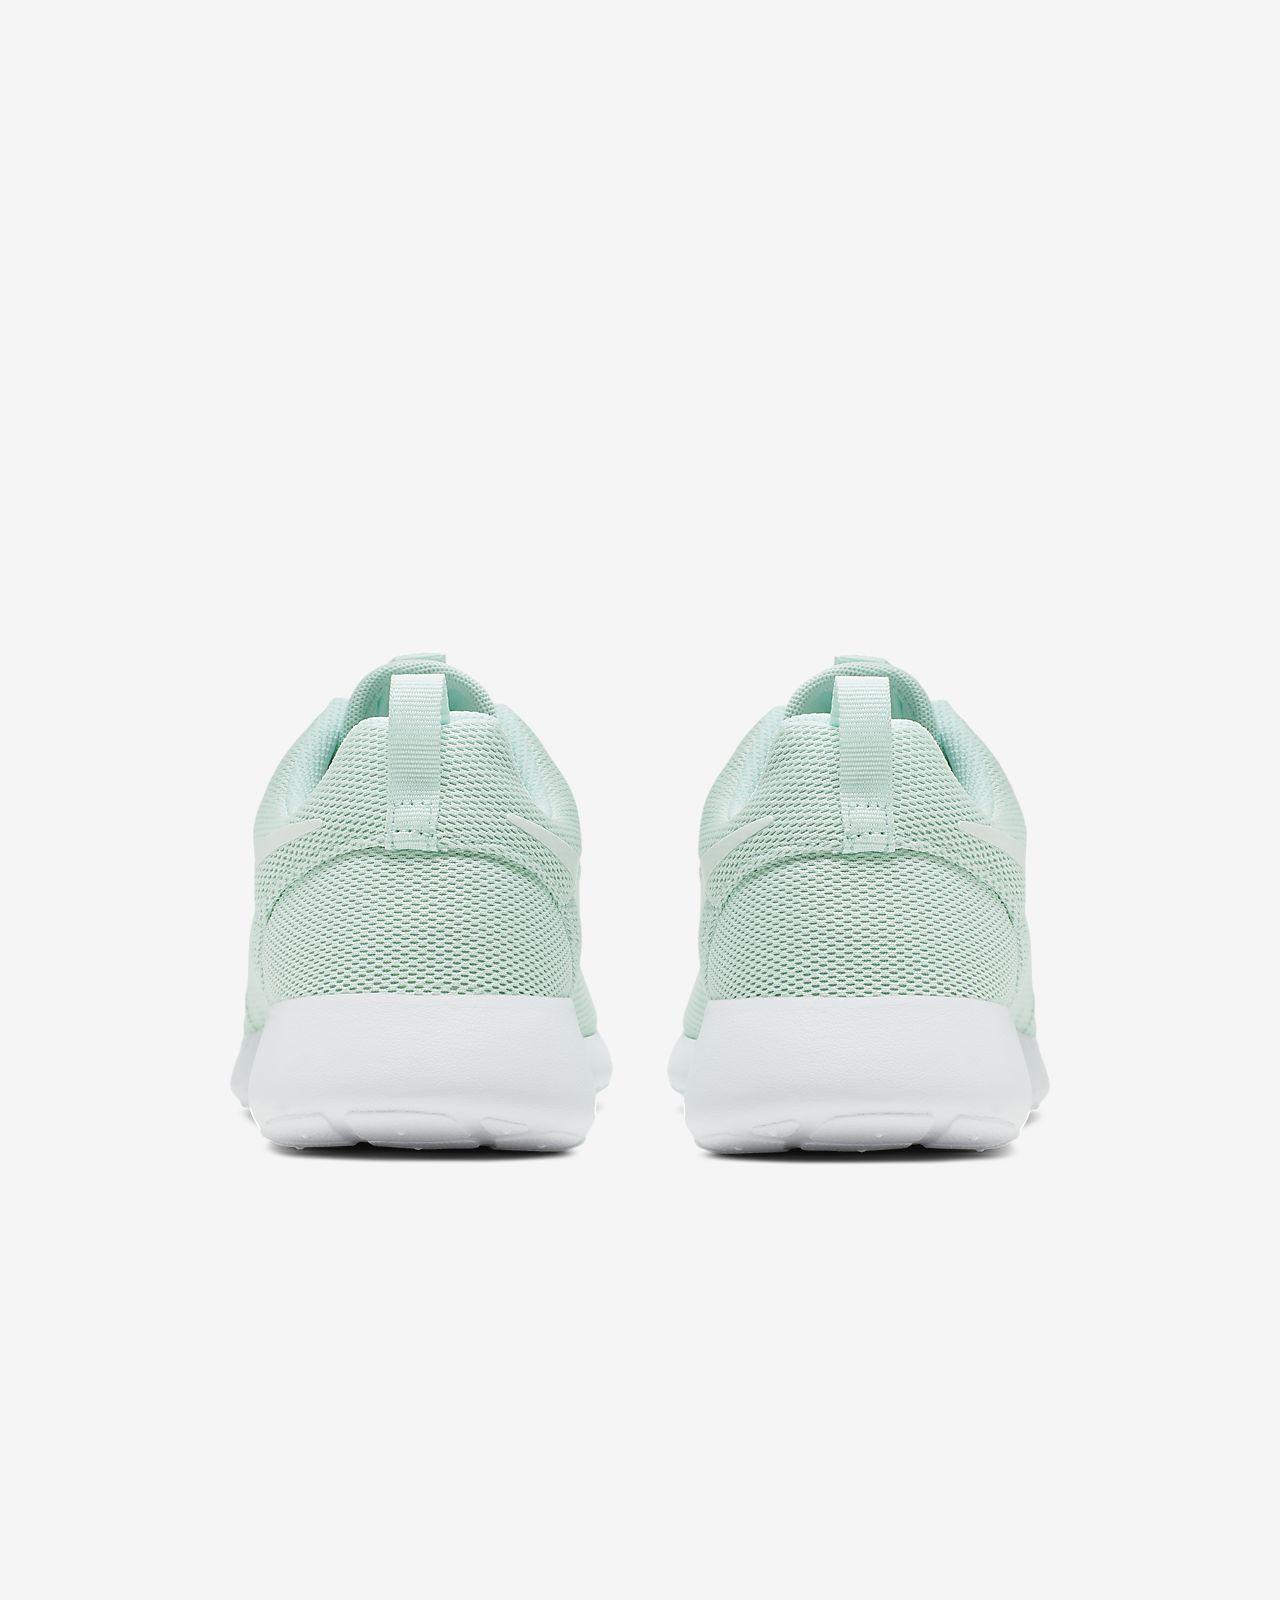 0630d2ac837 Nike Roshe One Women's Shoe. Nike.com